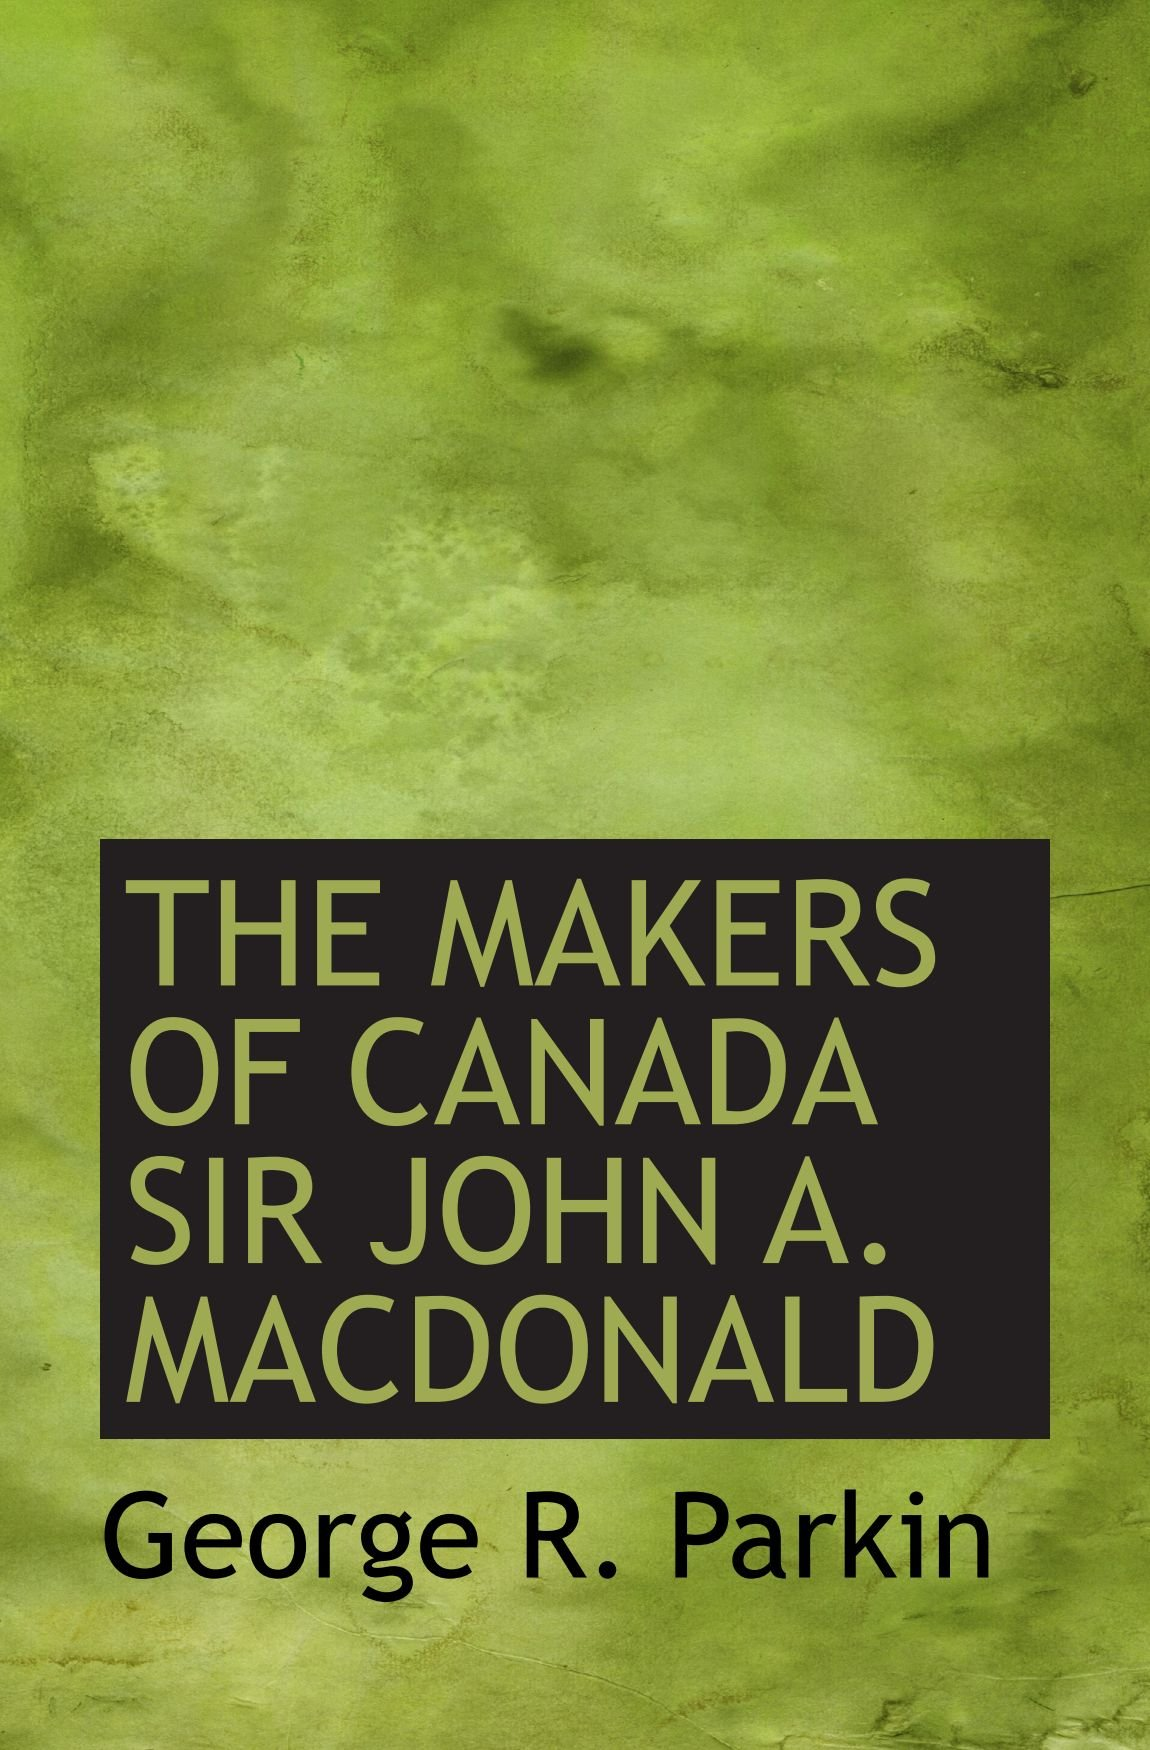 Download THE MAKERS OF CANADA SIR JOHN A. MACDONALD pdf epub